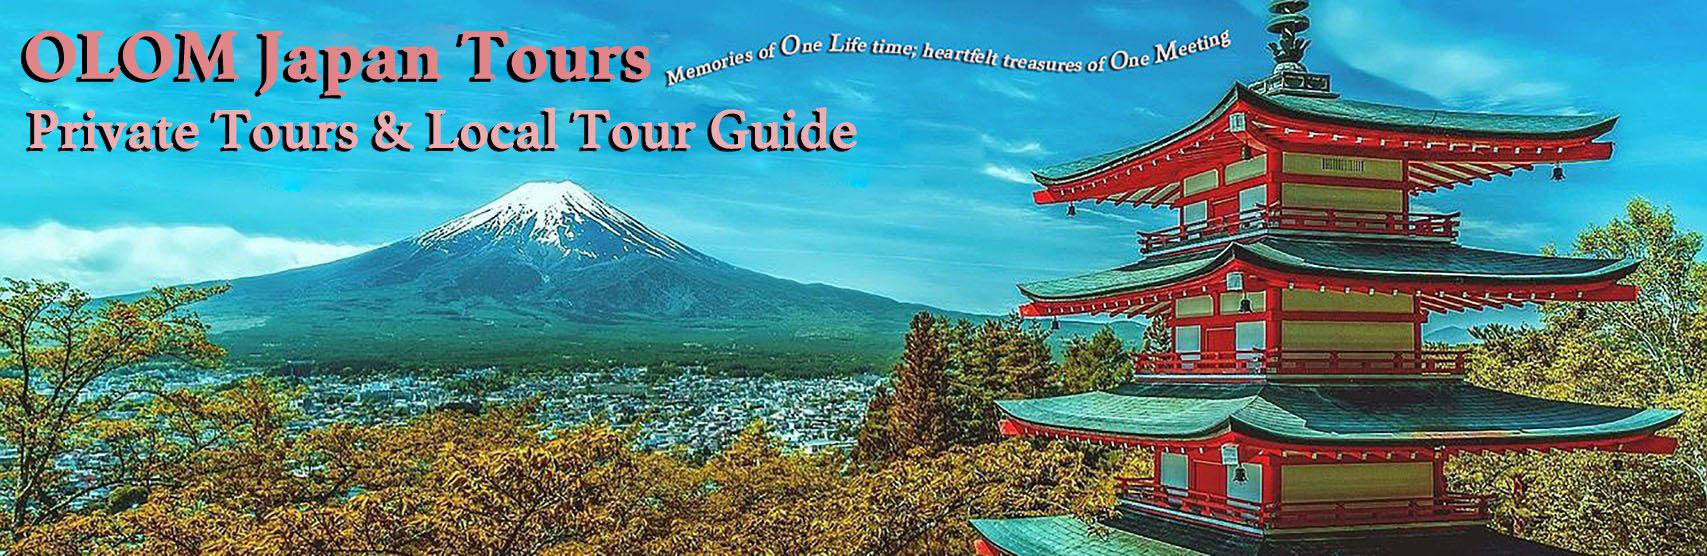 OLOM Japan Tours